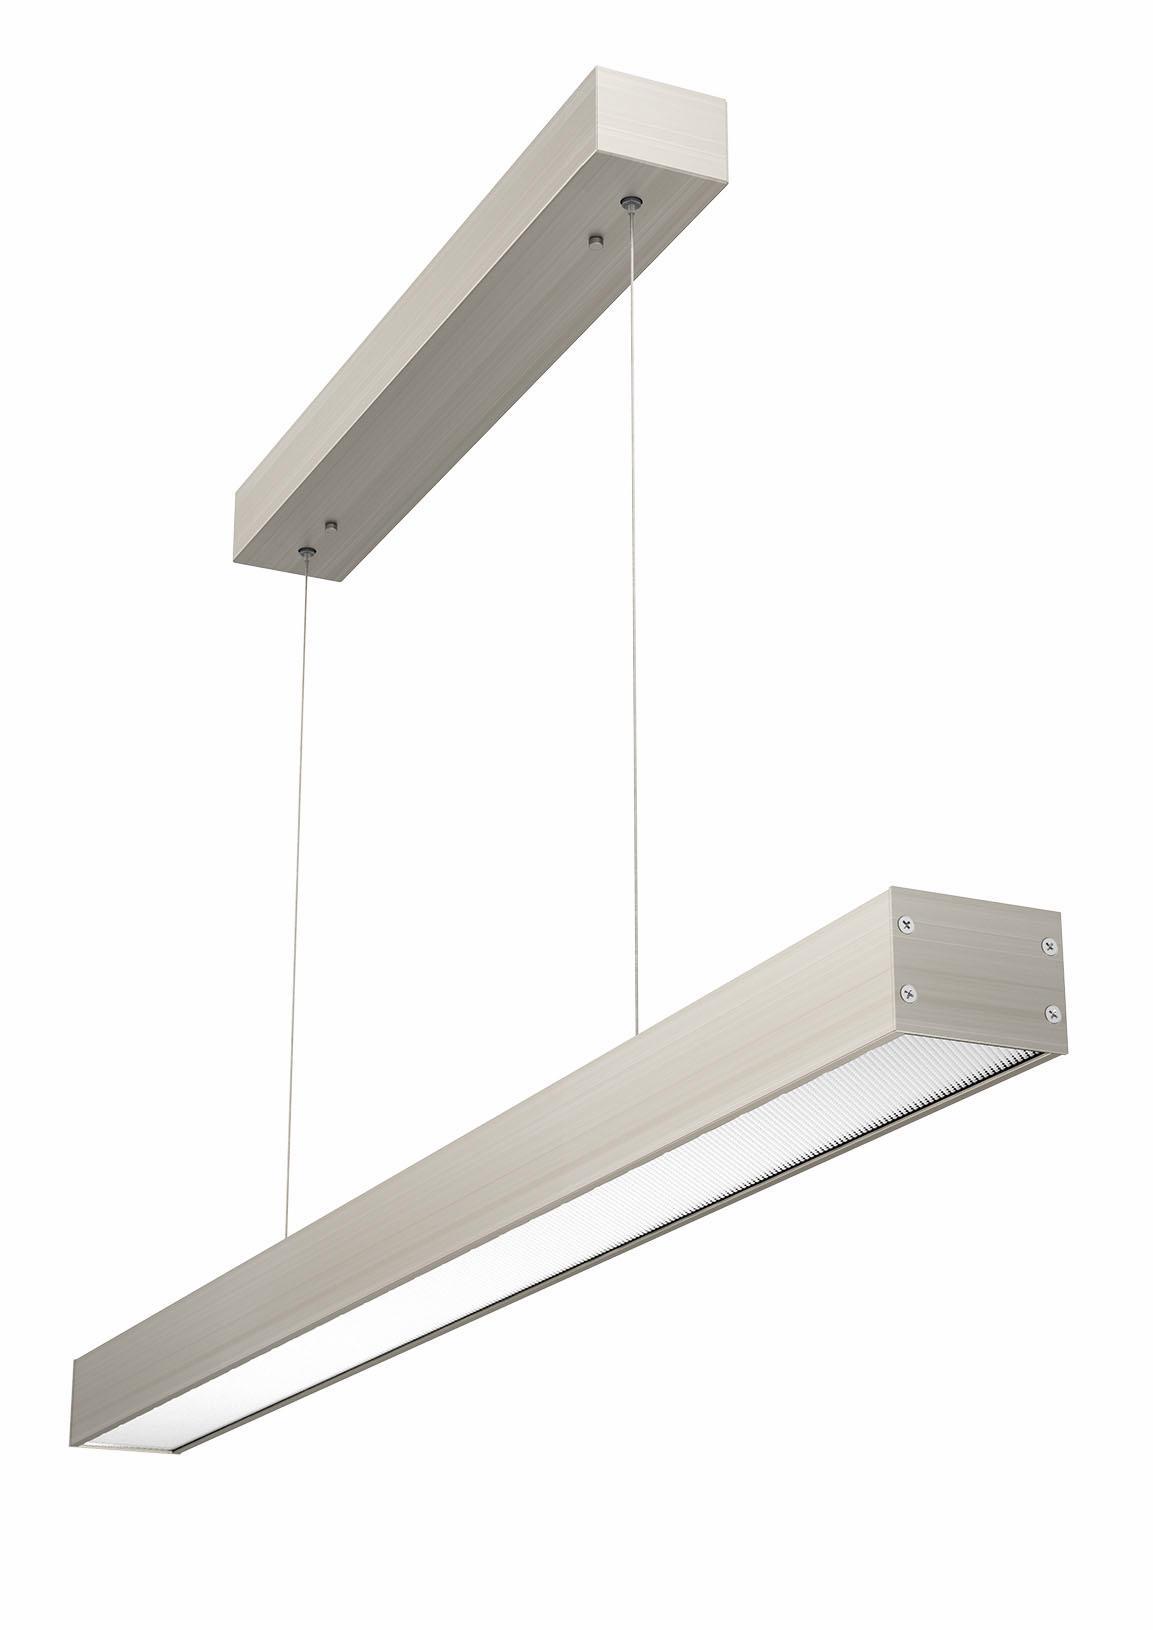 EVOTEC LED Pendelleuchte OFFICE ONE, LED-Board, Neutralweiß, LED Hängelampe, LED Hängeleuchte, dimmbar